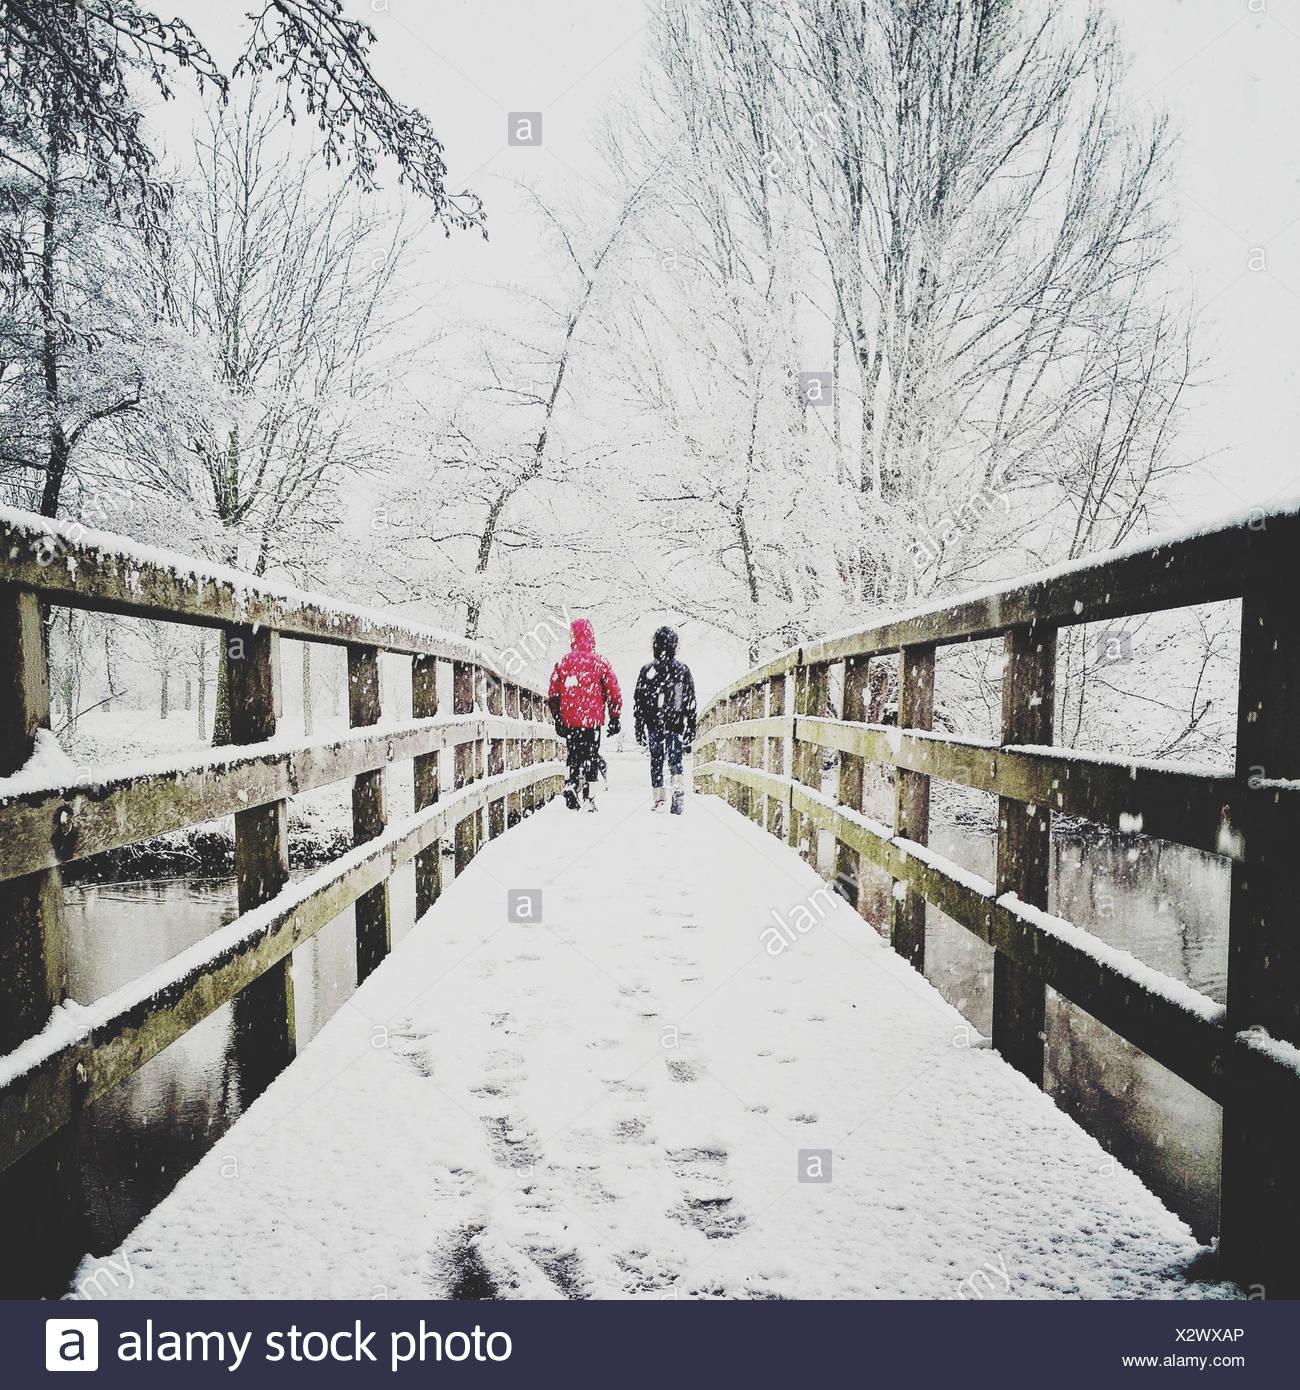 Rear view of two children walking across footbridge in the snow Stock Photo